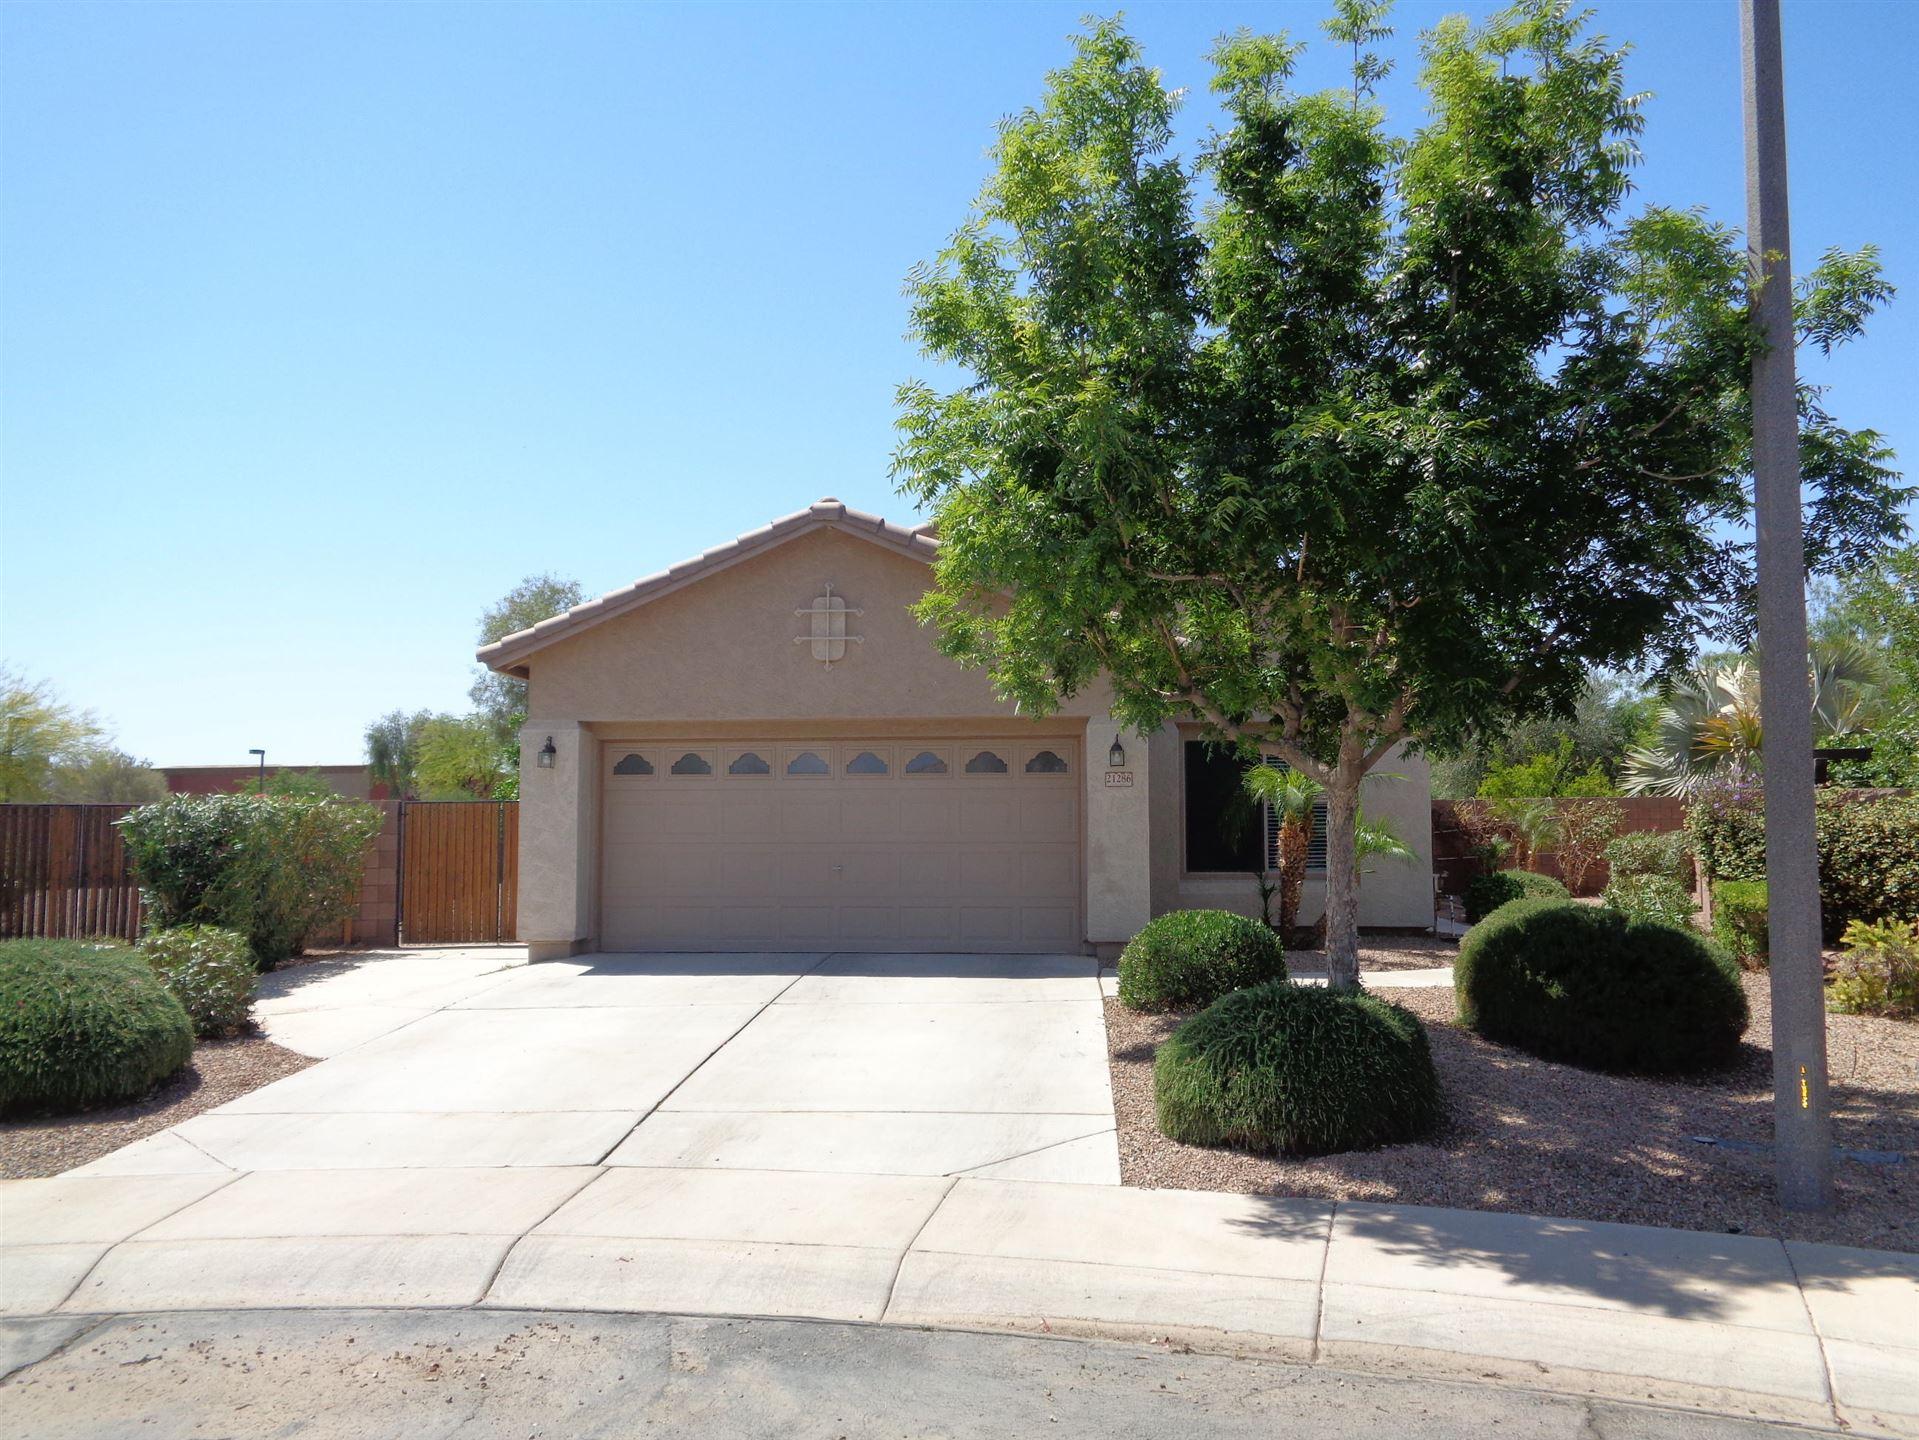 Photo for 21286 N SUNSET Drive, Maricopa, AZ 85139 (MLS # 6233568)